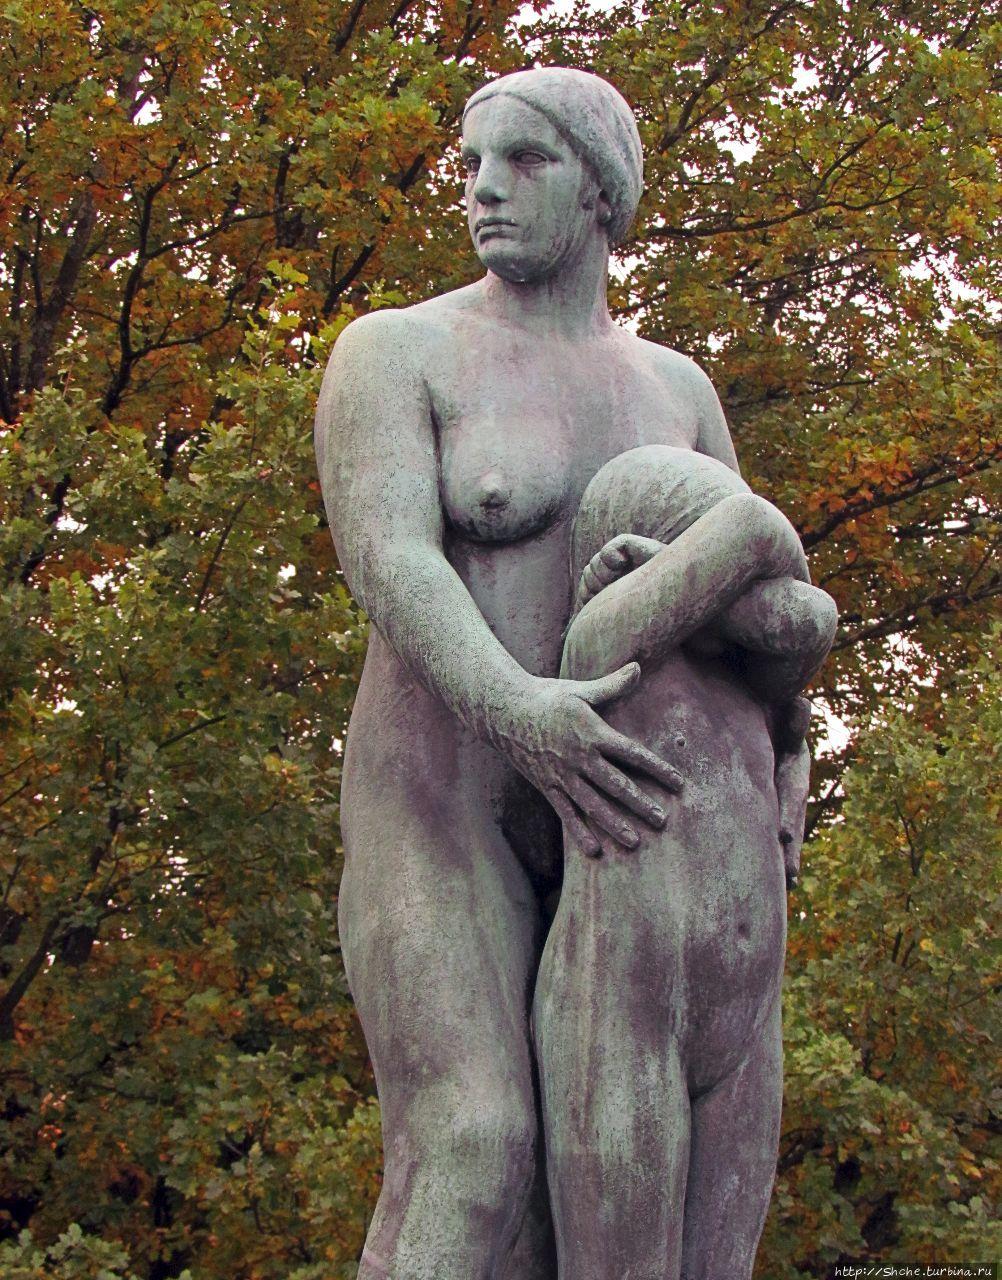 Парк скульптур Вигеланда Осло, Норвегия